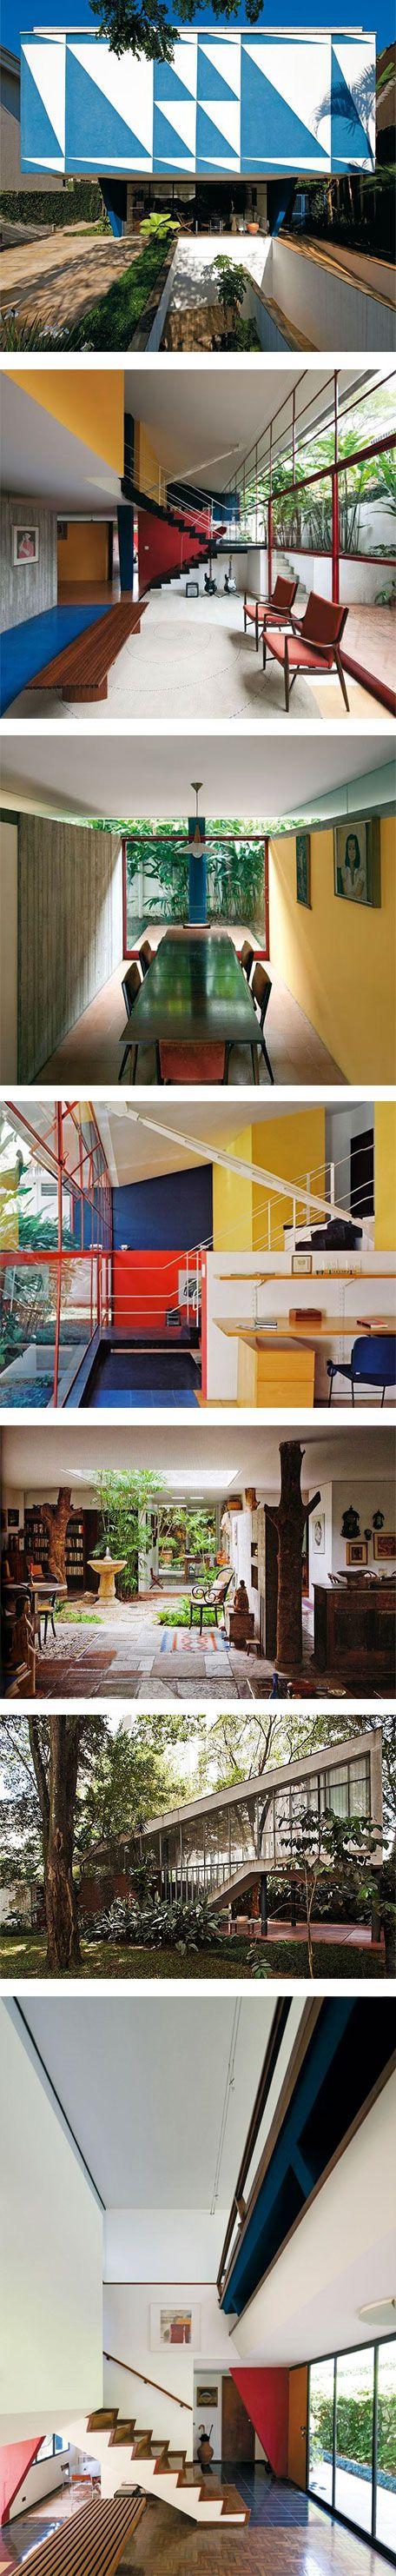 7 beautiful houses by João Vilanova Artigas that will make you want to live in Brazil via Nuji.com